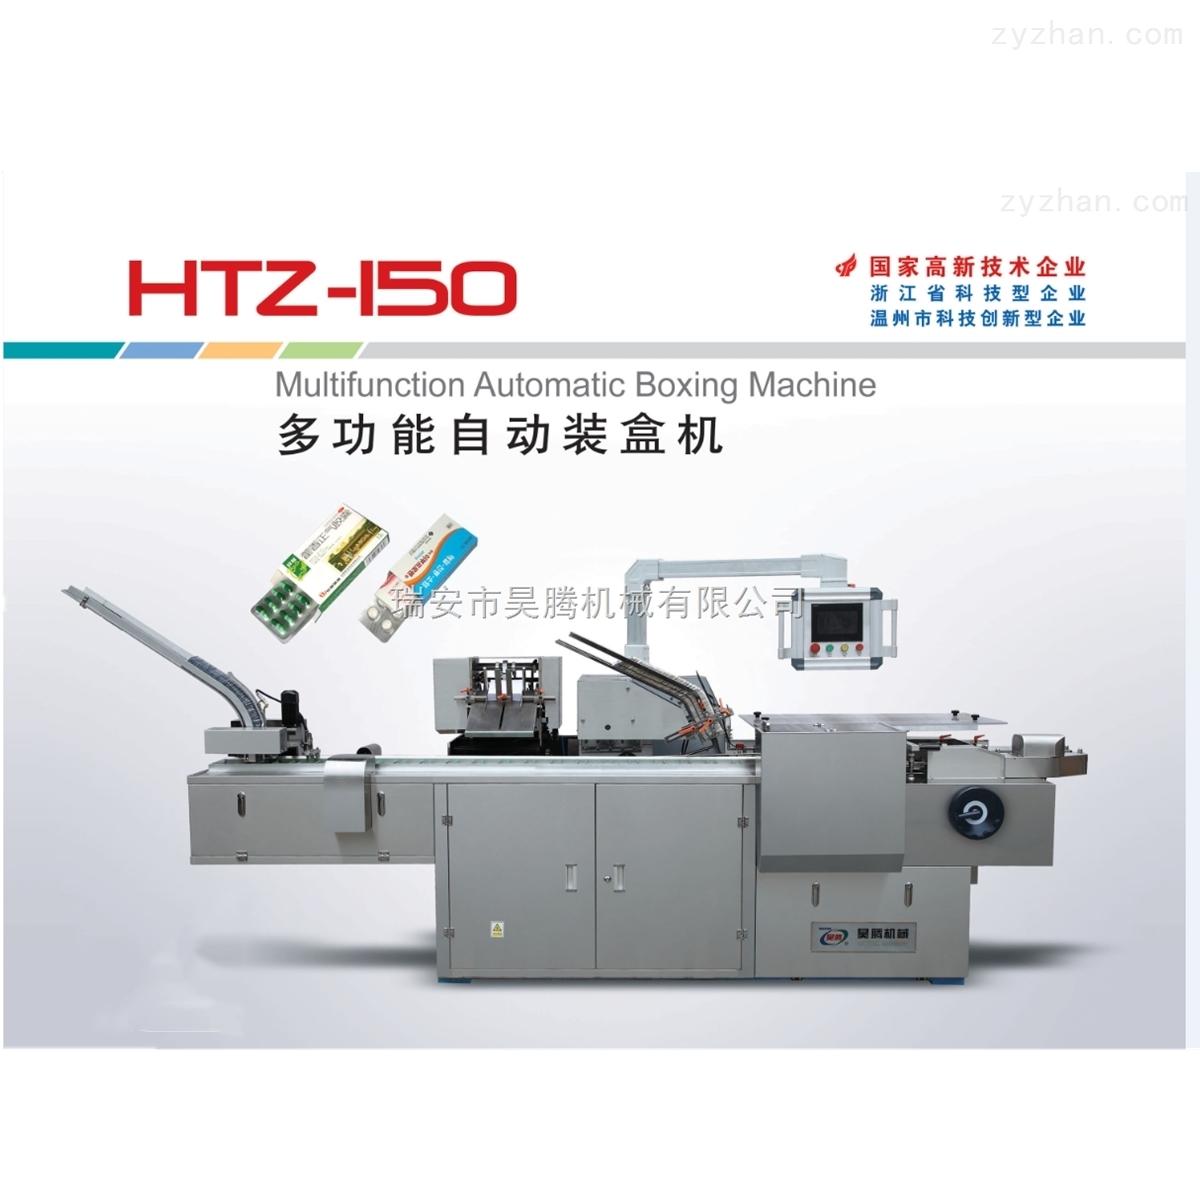 HTZ-150型多功能自动装盒机